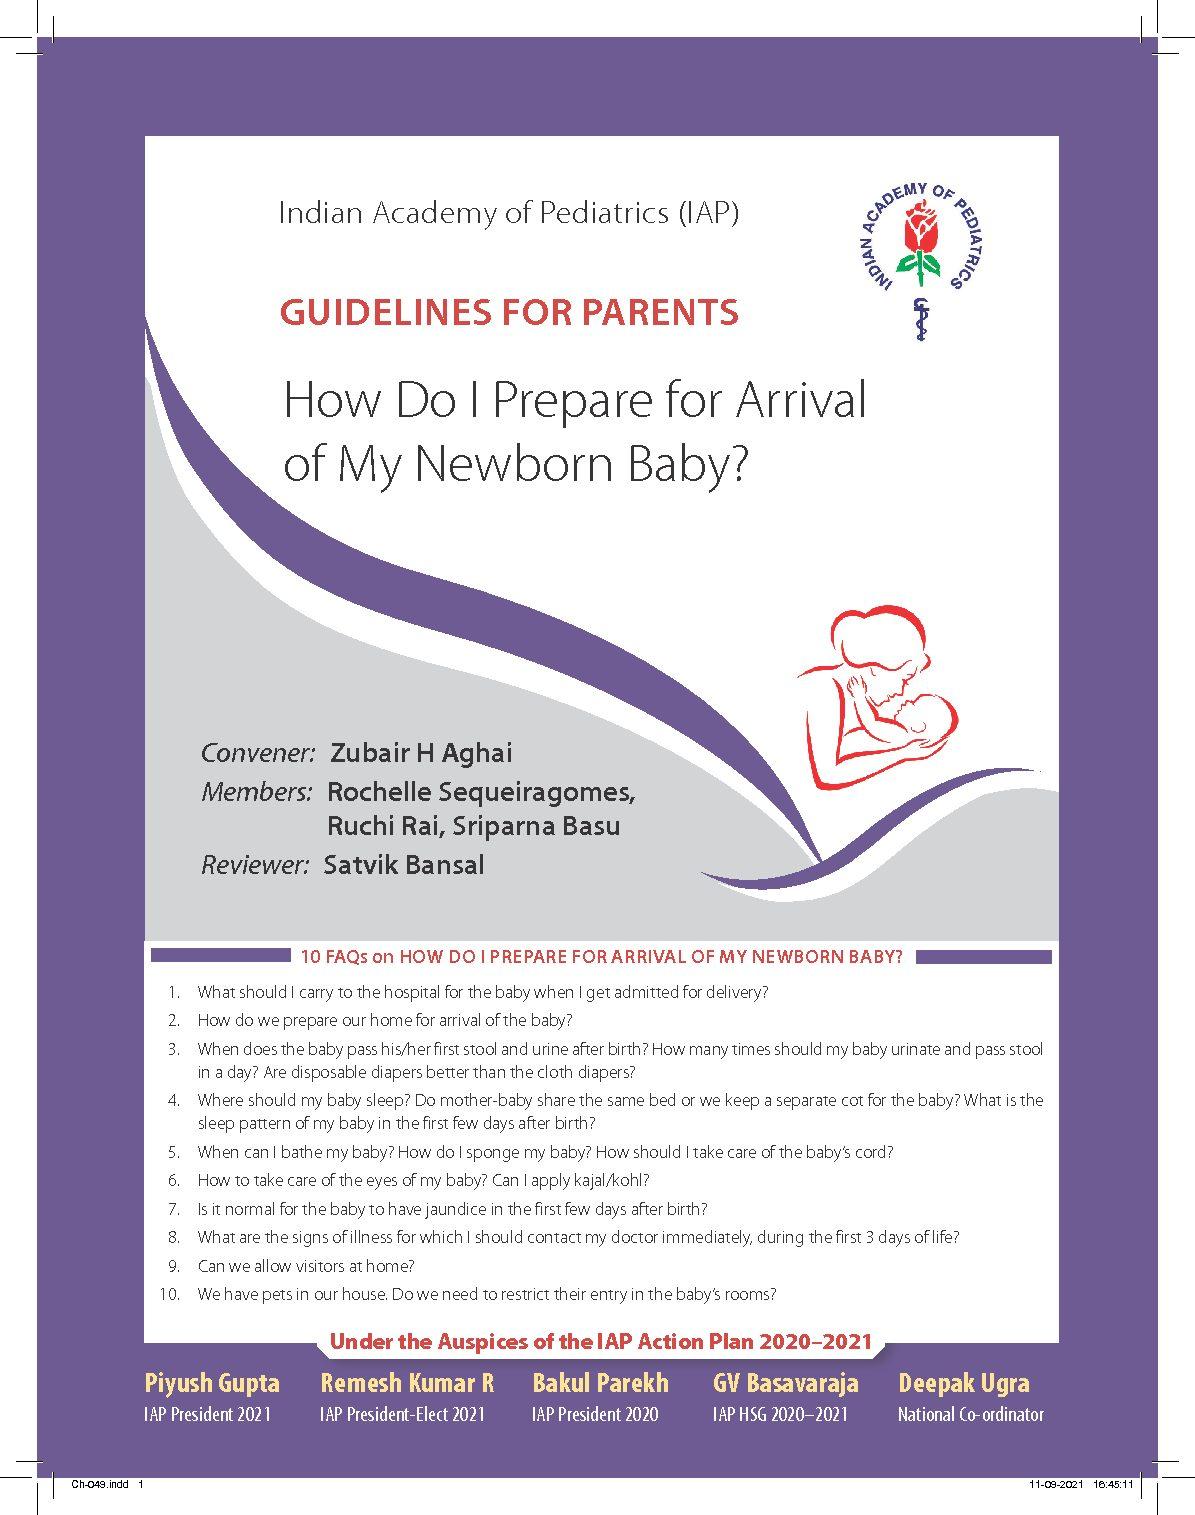 Ch-049-Newborn-preparing-for-IAP-Parental-Guidelines-1-pdf.jpg